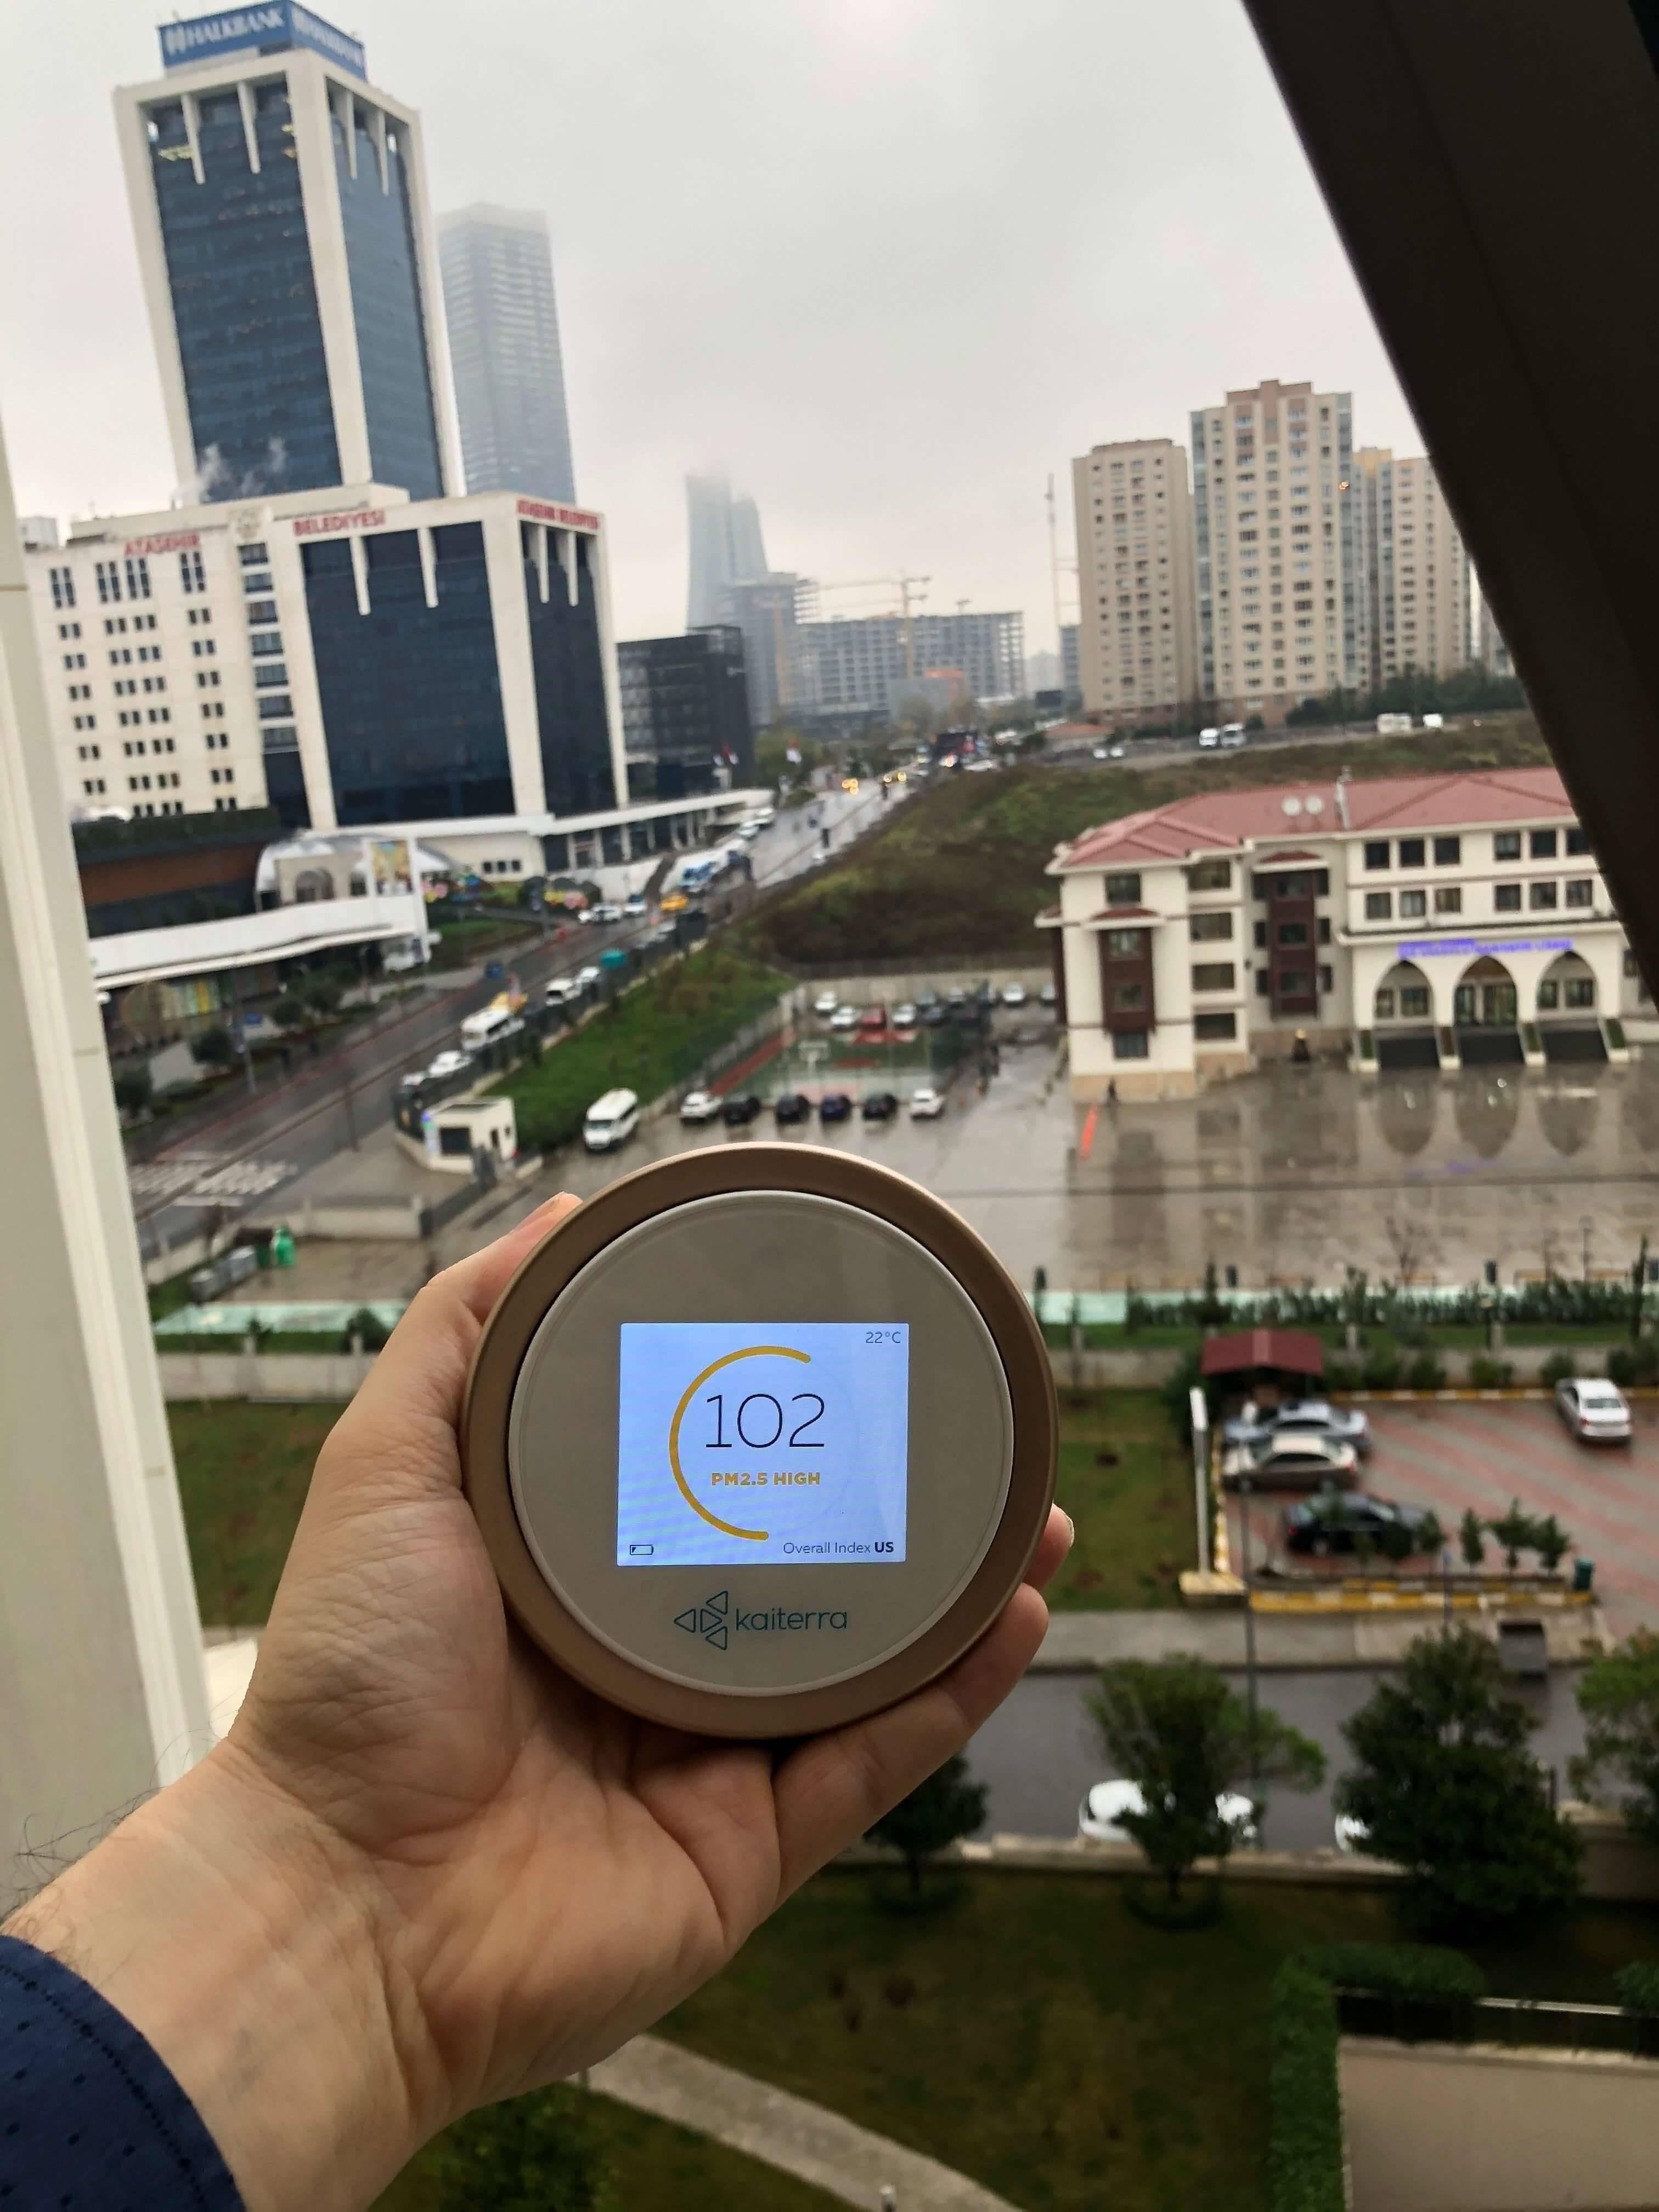 Bati Atasehir Istanbul Hava Kalitesi Kirlilik2